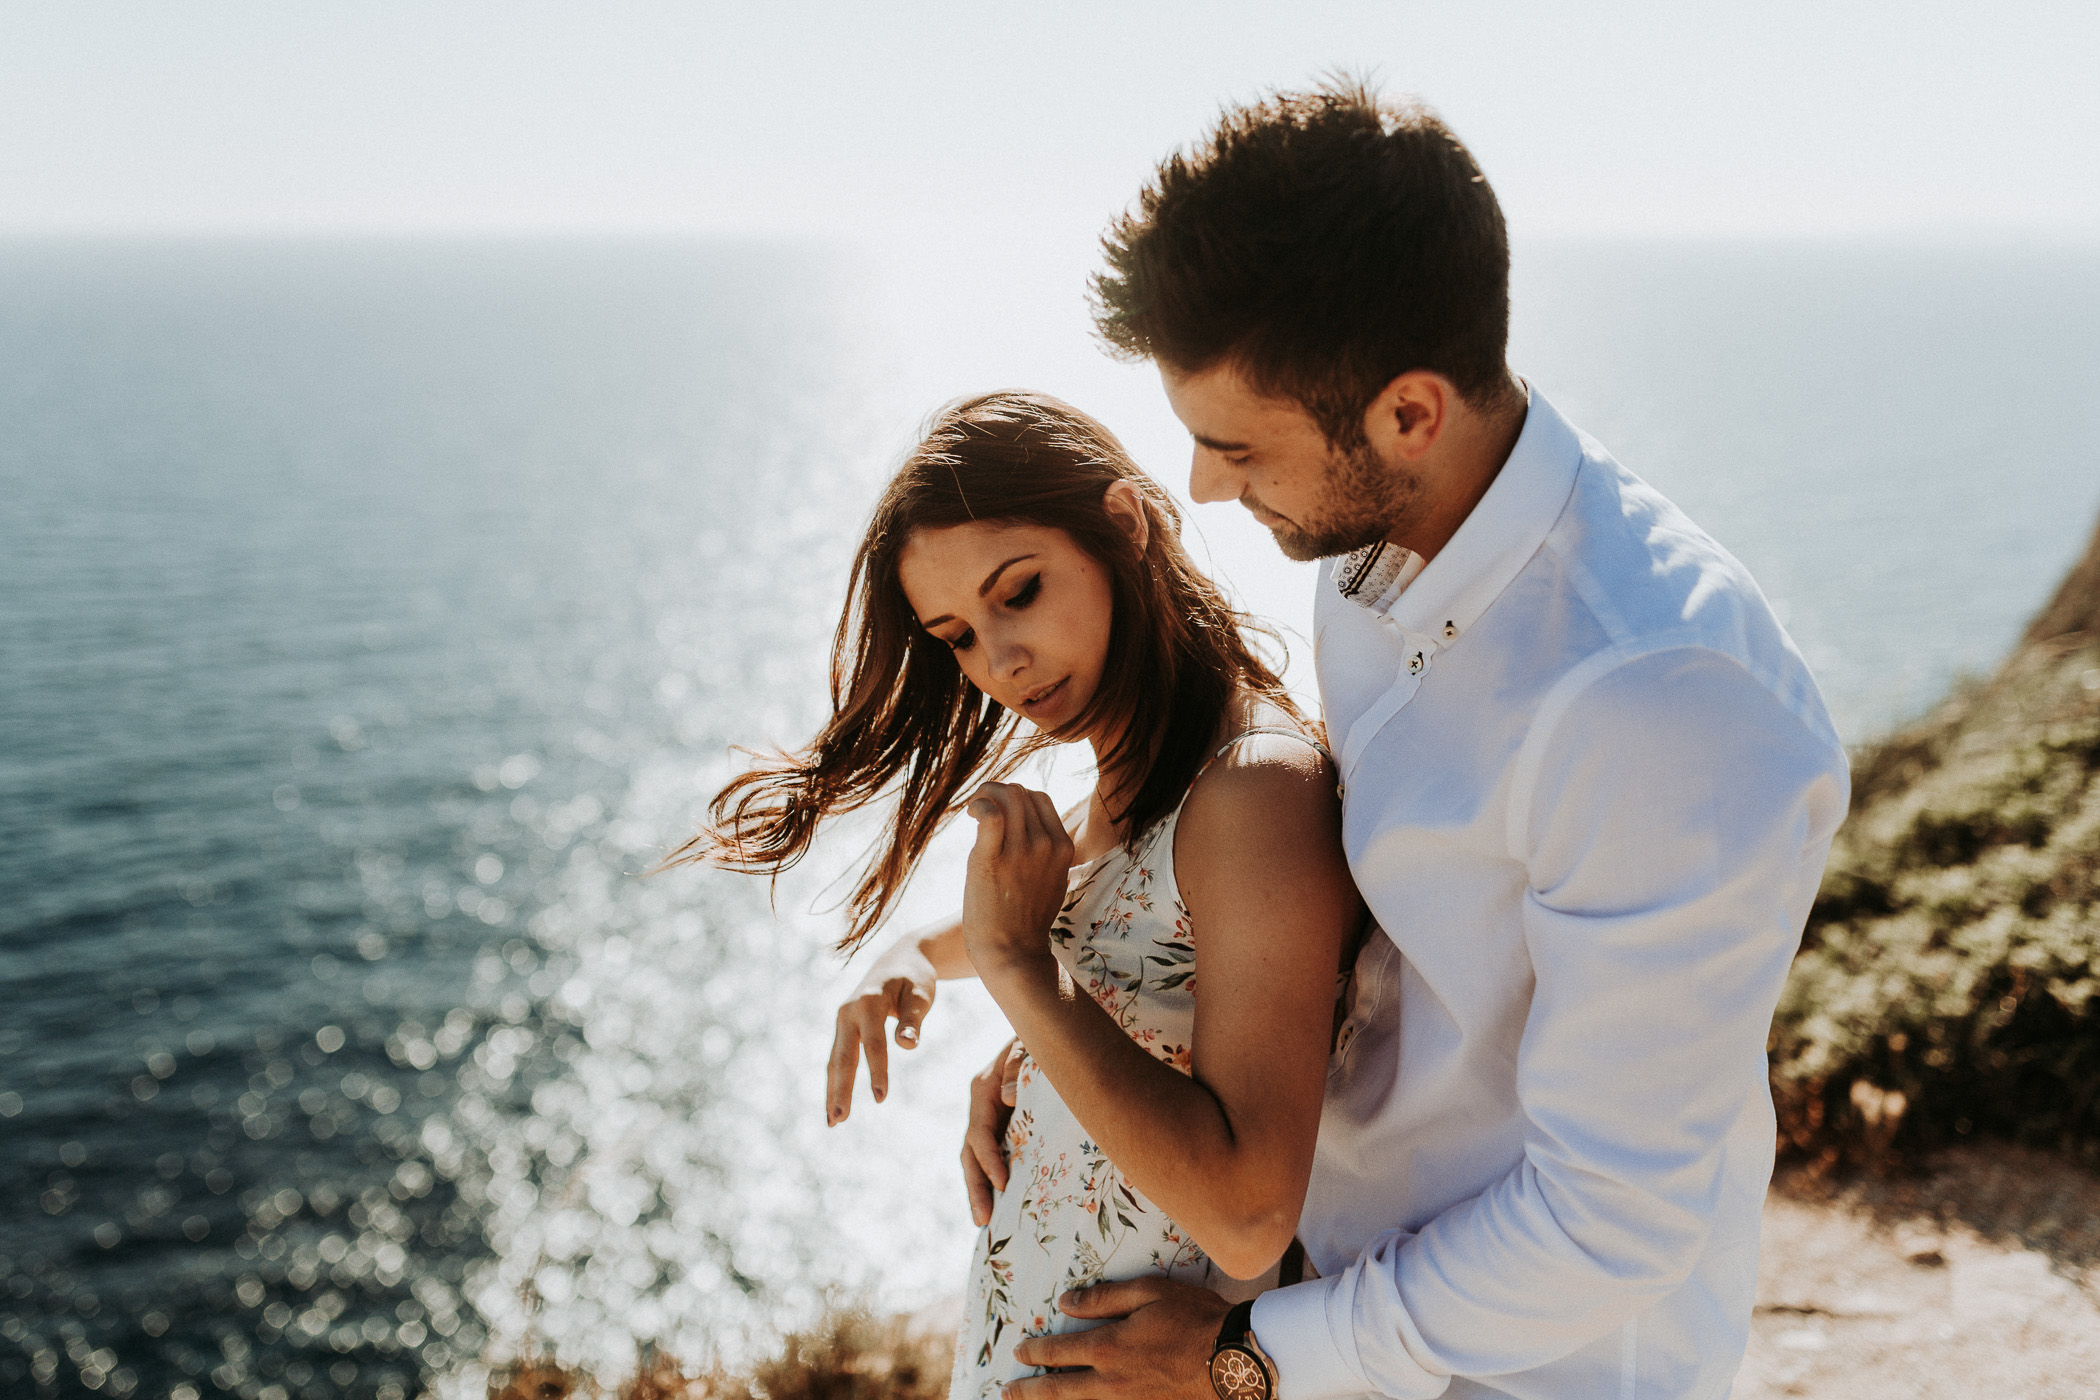 DanielaMarquardtPhotography_wedding_elopement_mallorca_spain_calapi_palma_lauraandtoni_74